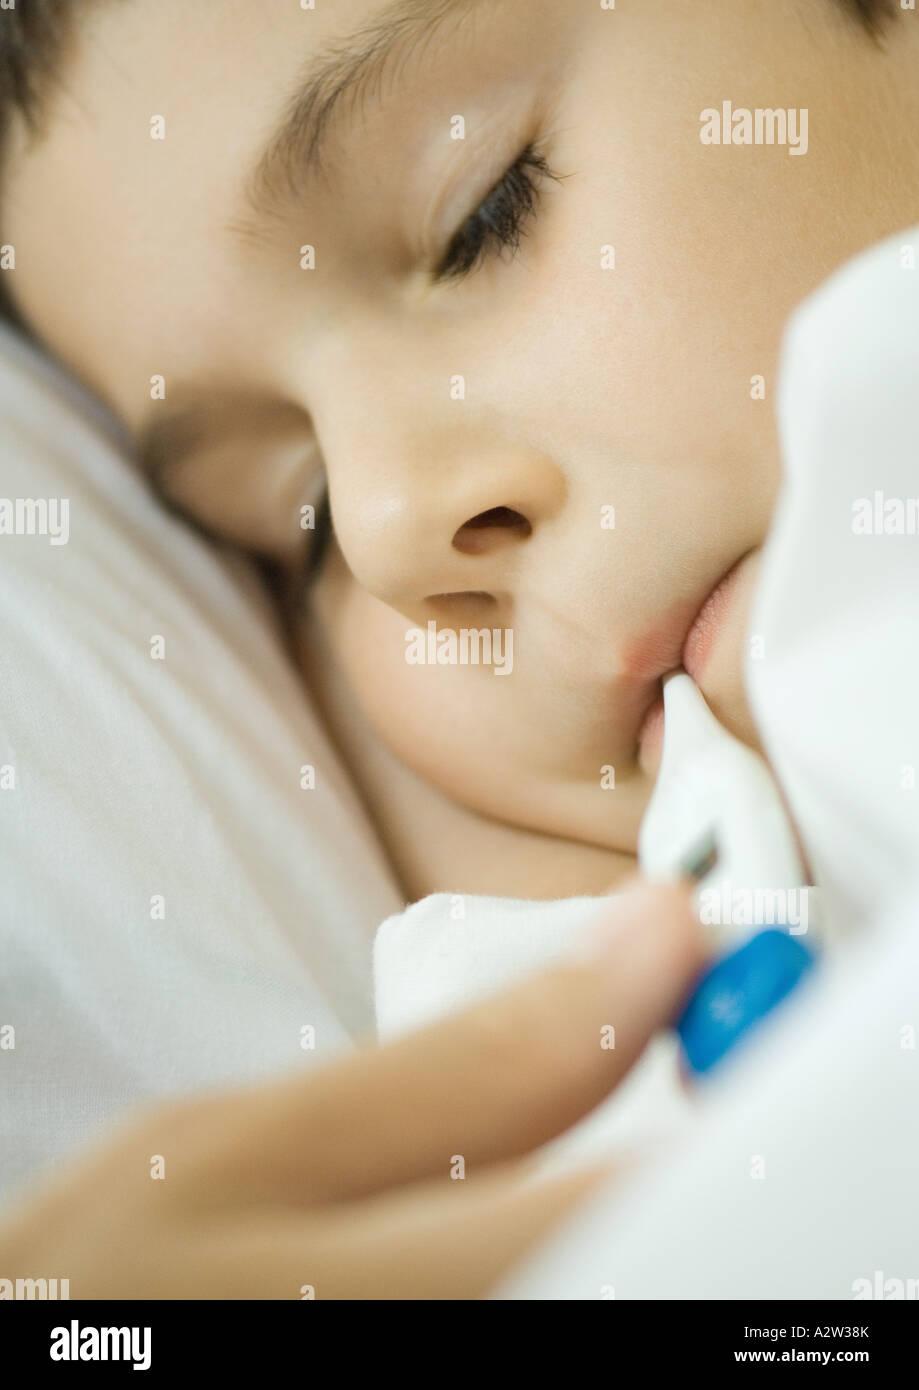 Child having temperature taken Stock Photo